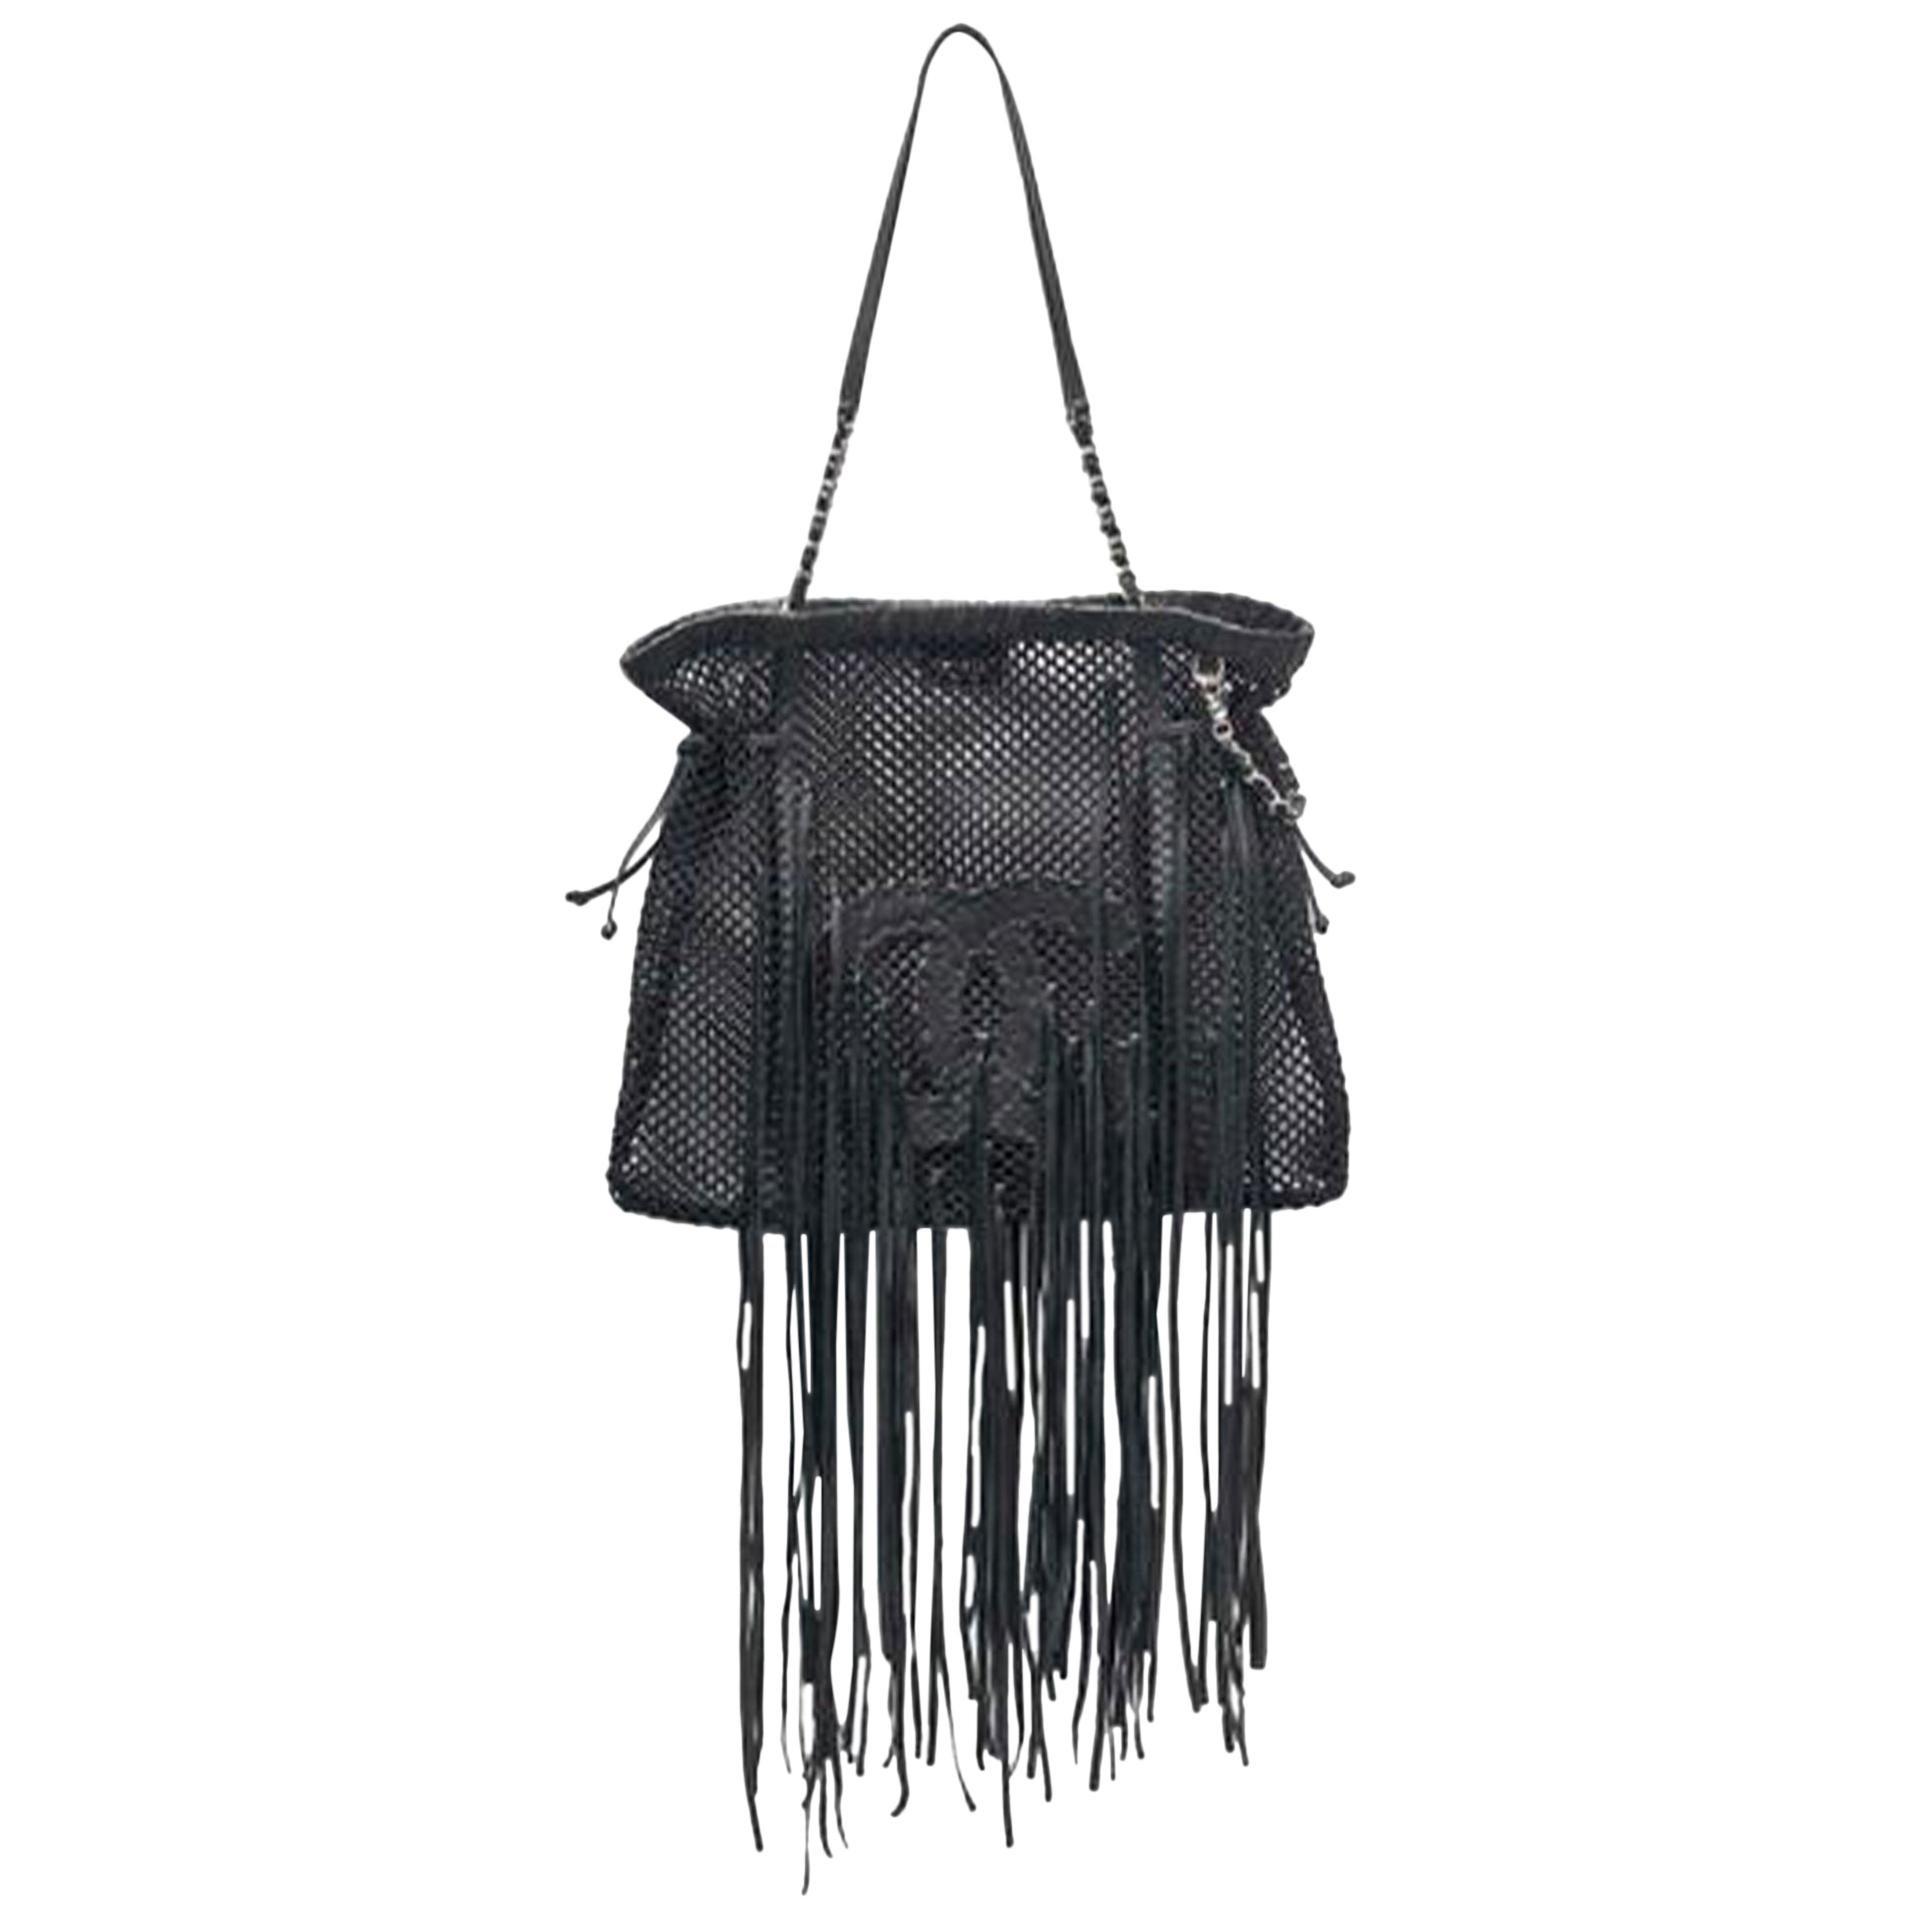 Chanel Timeless Fringe Large Mesh Black Leather Tote